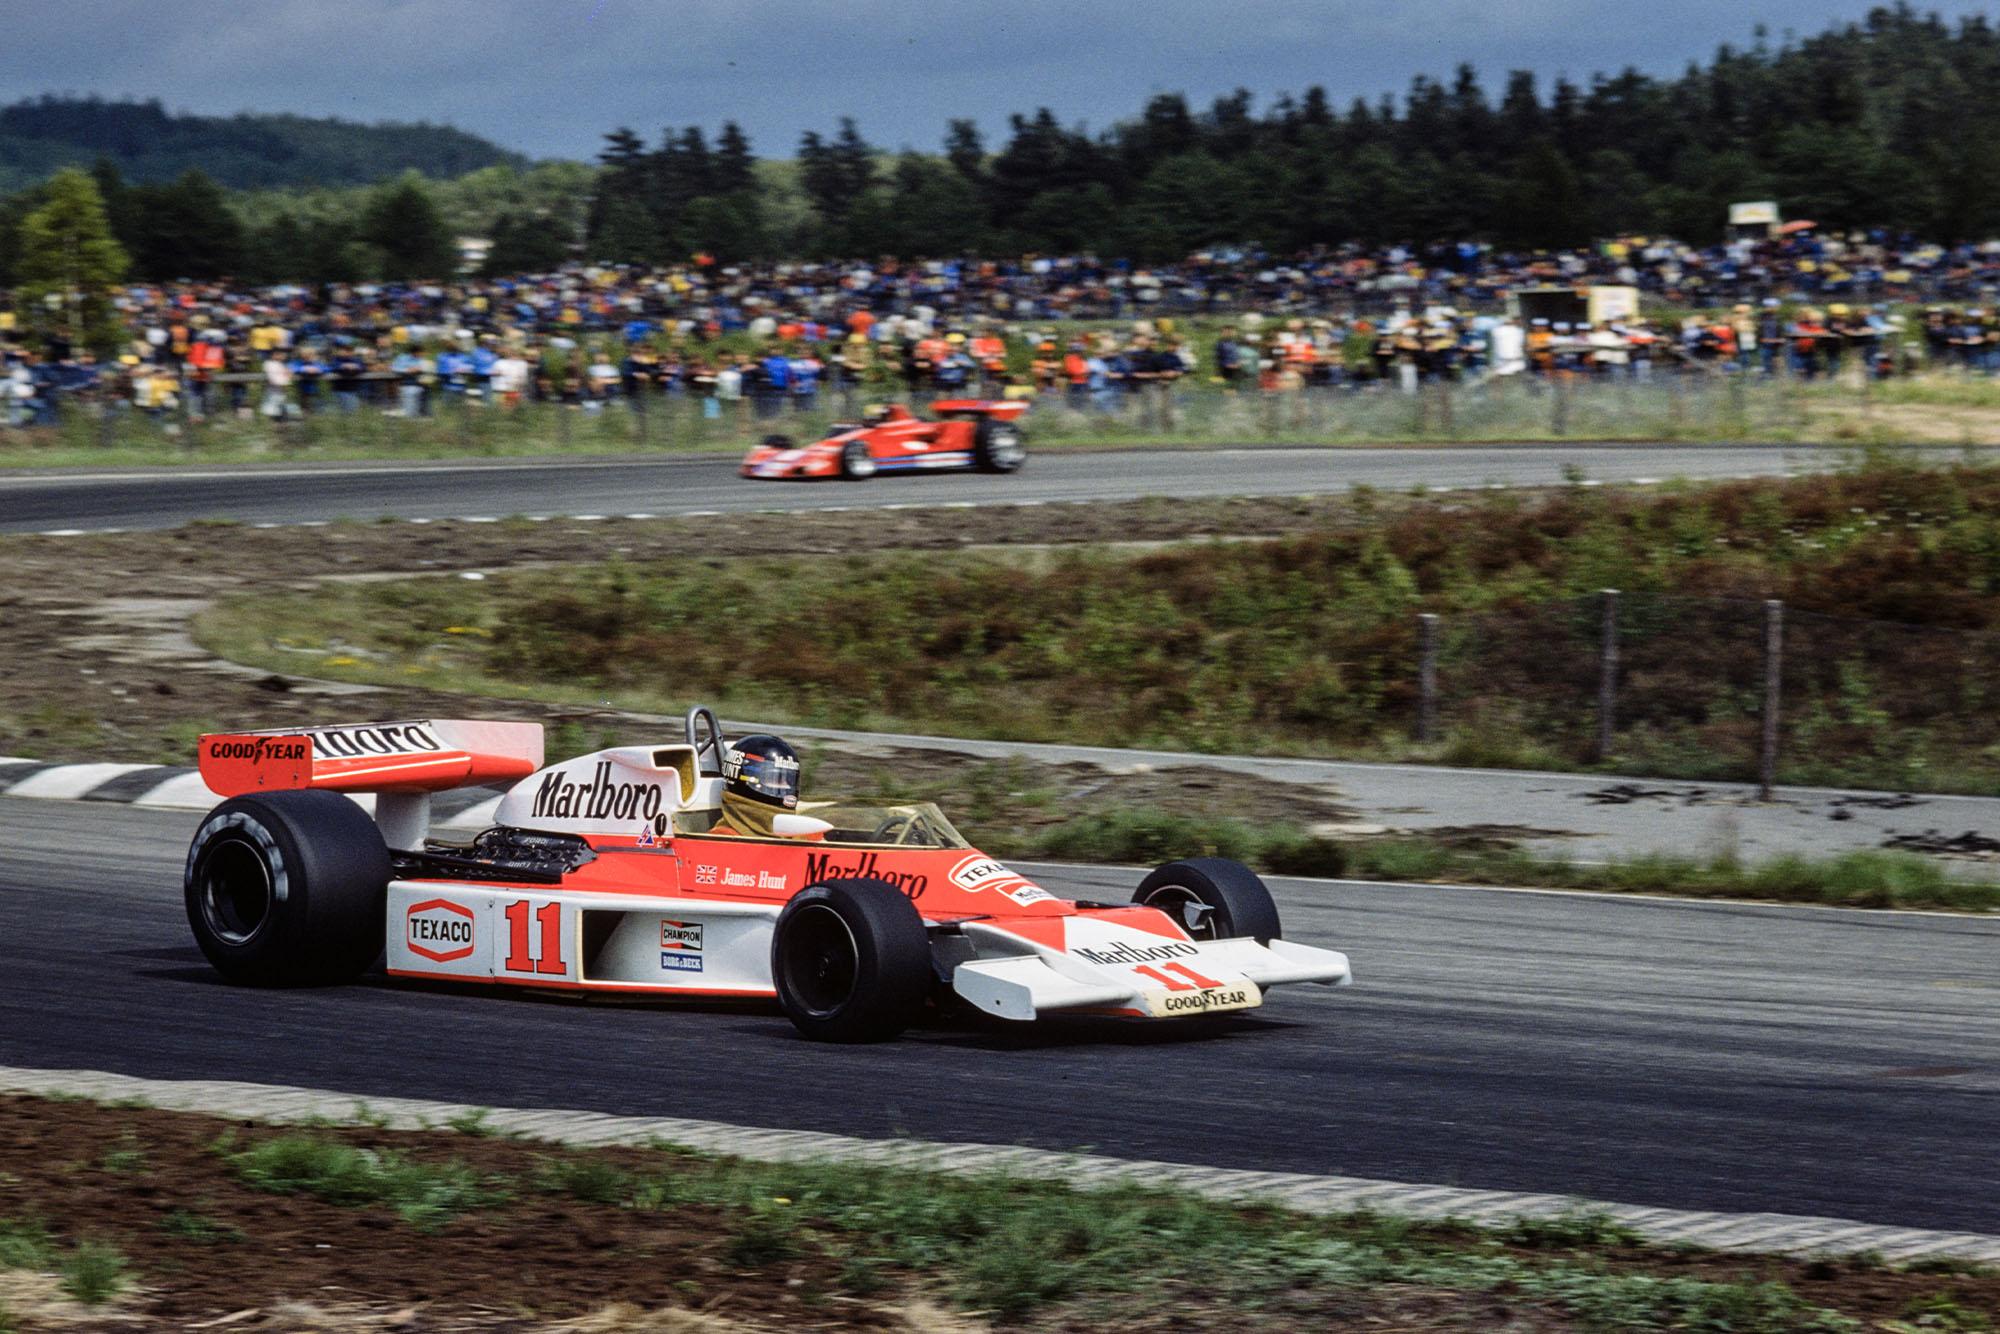 James Hunt (McLaren) at the 1976 Swedish Grand Prix.